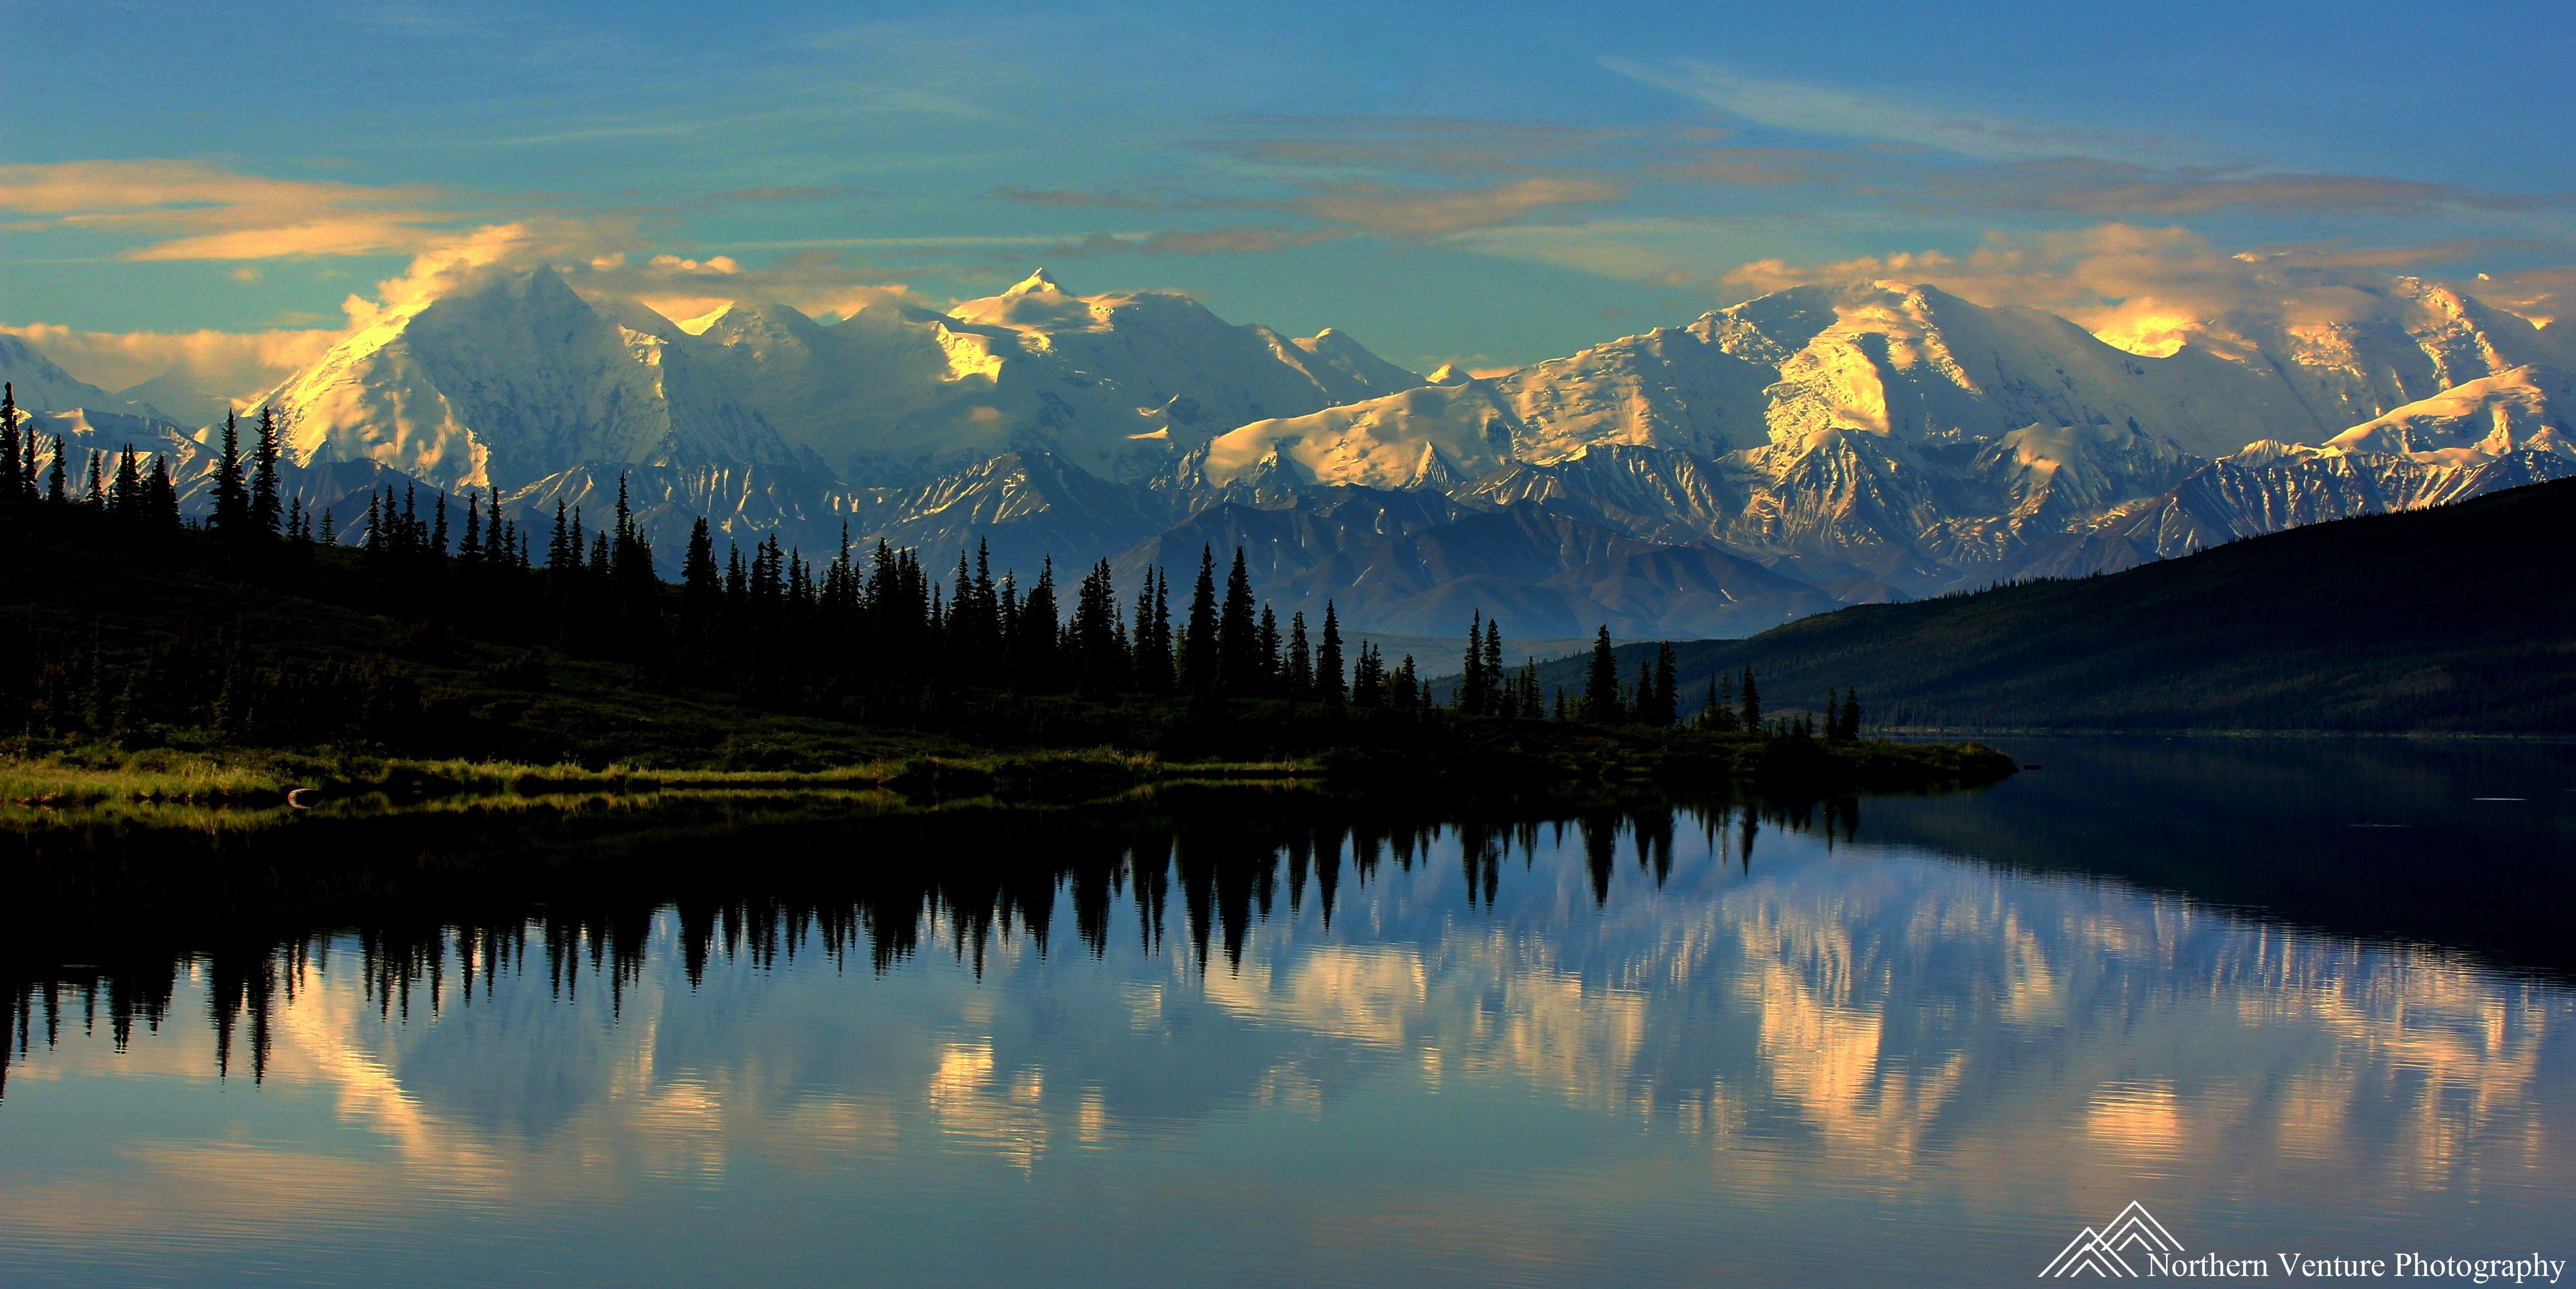 Alaska-Mountain-Range-Reflection-on-Wonder-Lake.jpg   UAF Sun Star